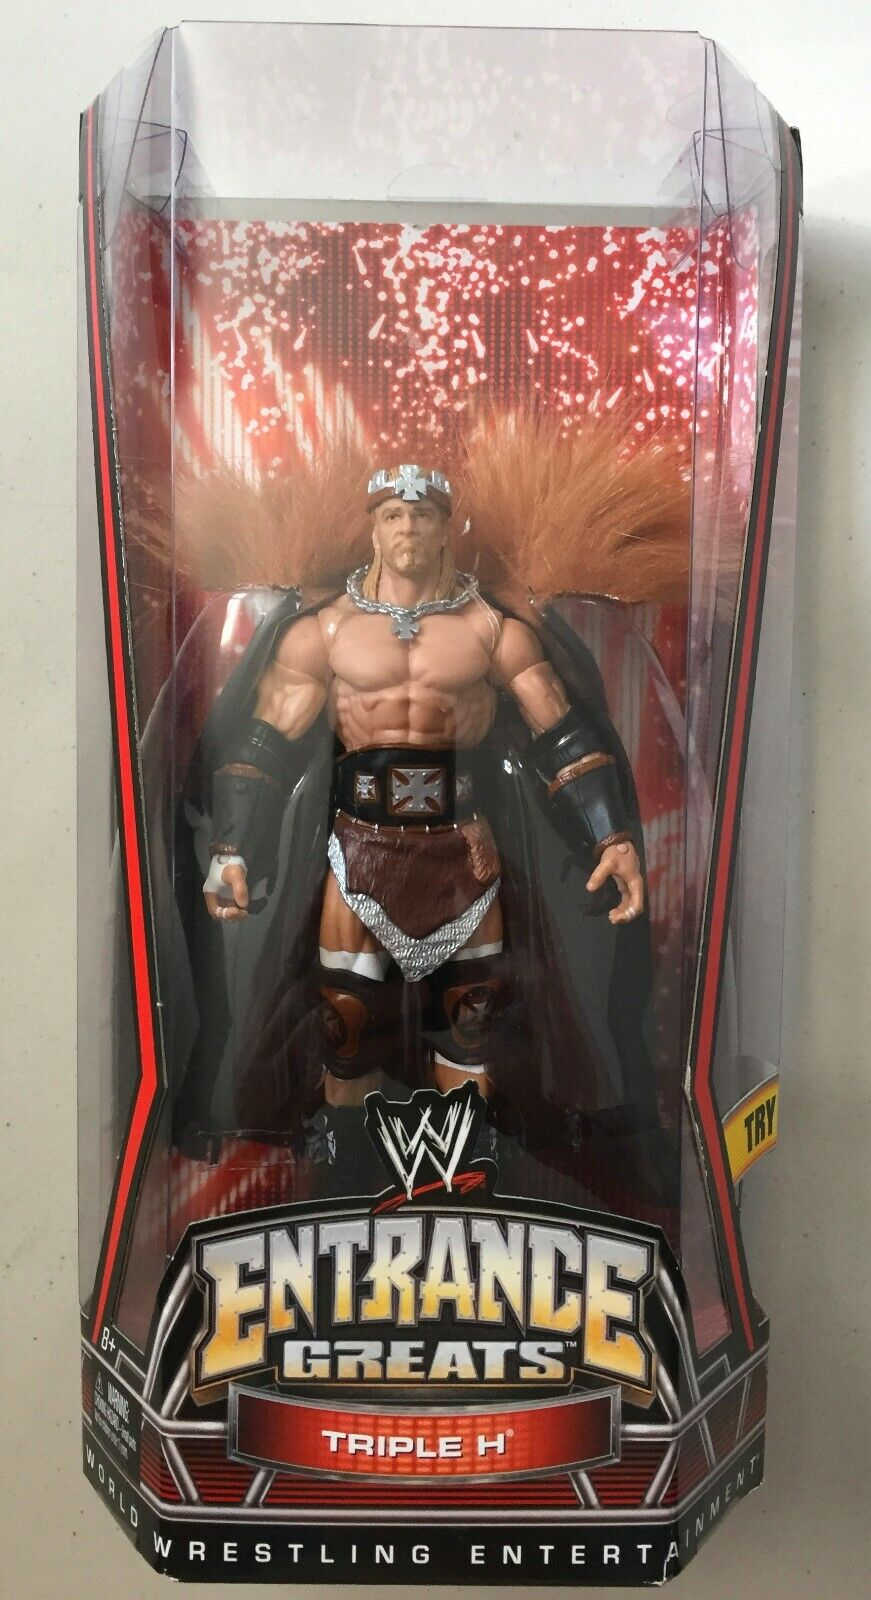 WWE Elite Entrance Greats THE GAME TRIPLE H HHH Wrestling Figure WWF